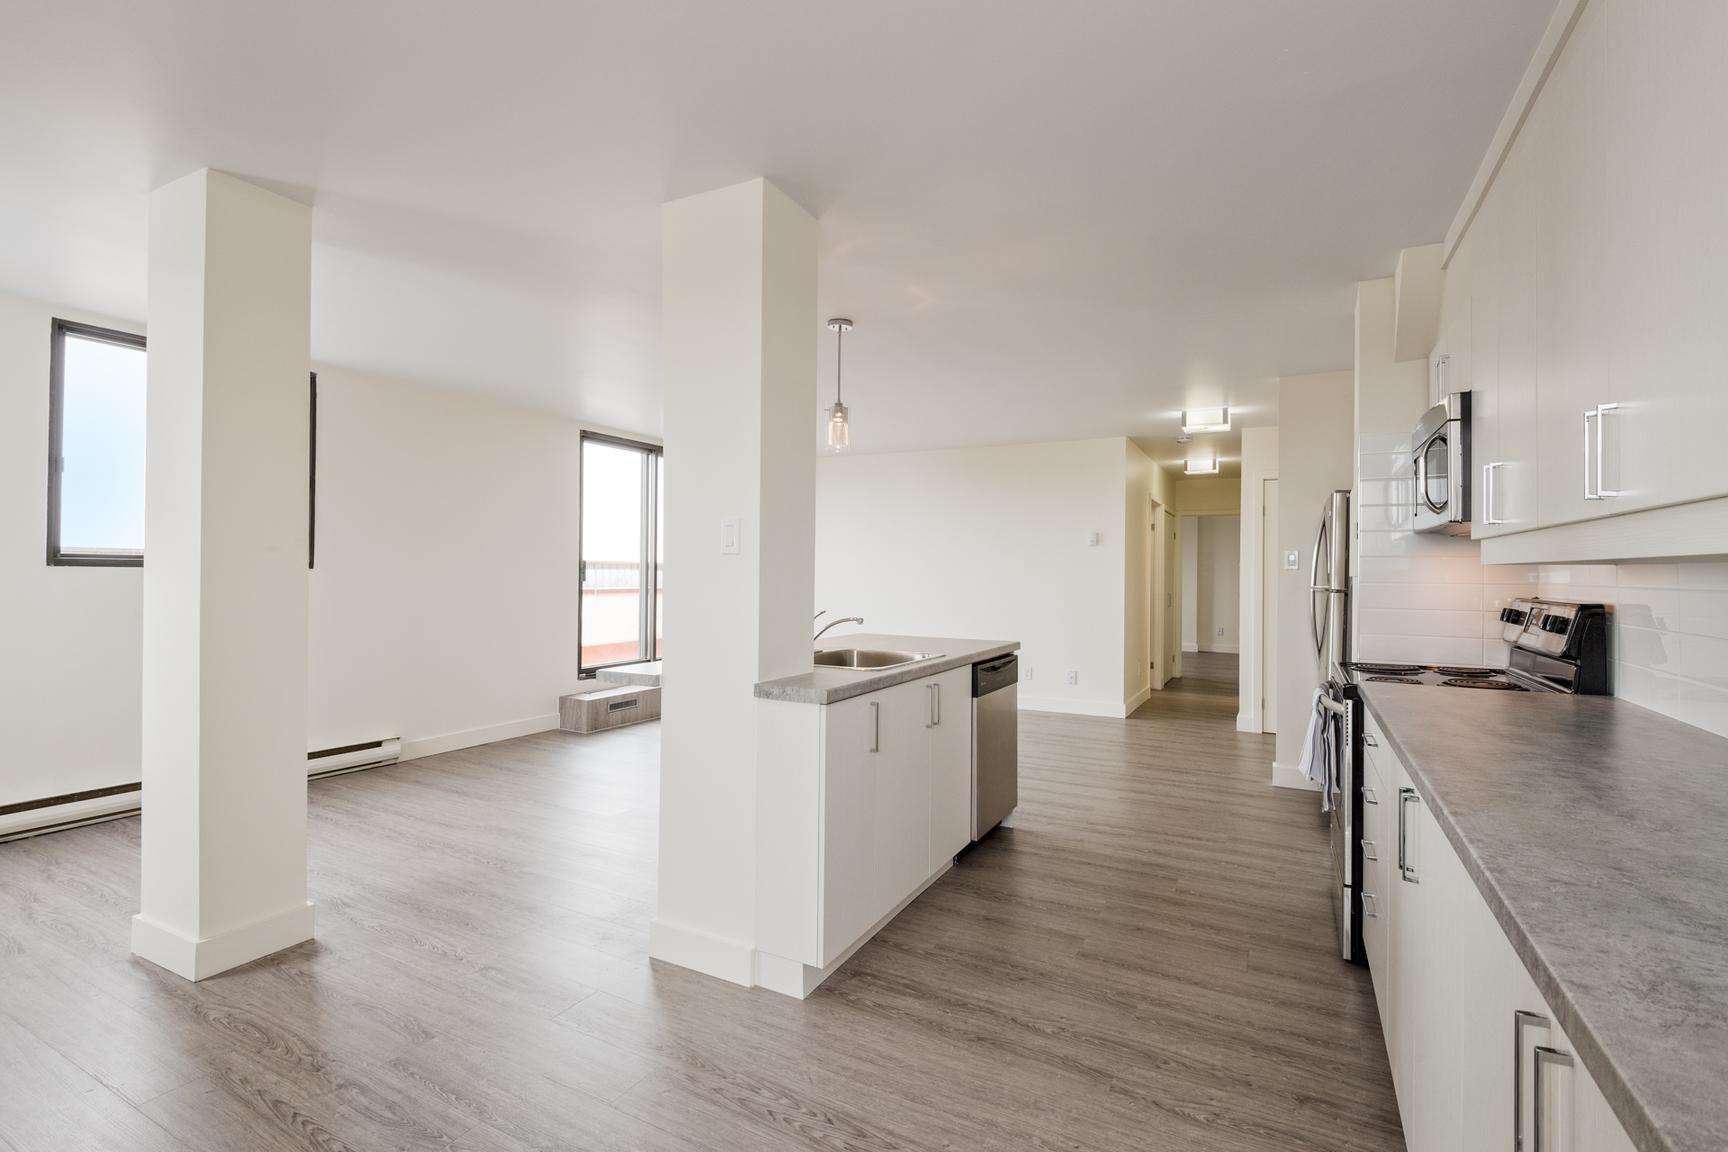 1 bedroom Apartments for rent in Laval at Le Quatre Cent - Photo 15 - RentersPages – L407183